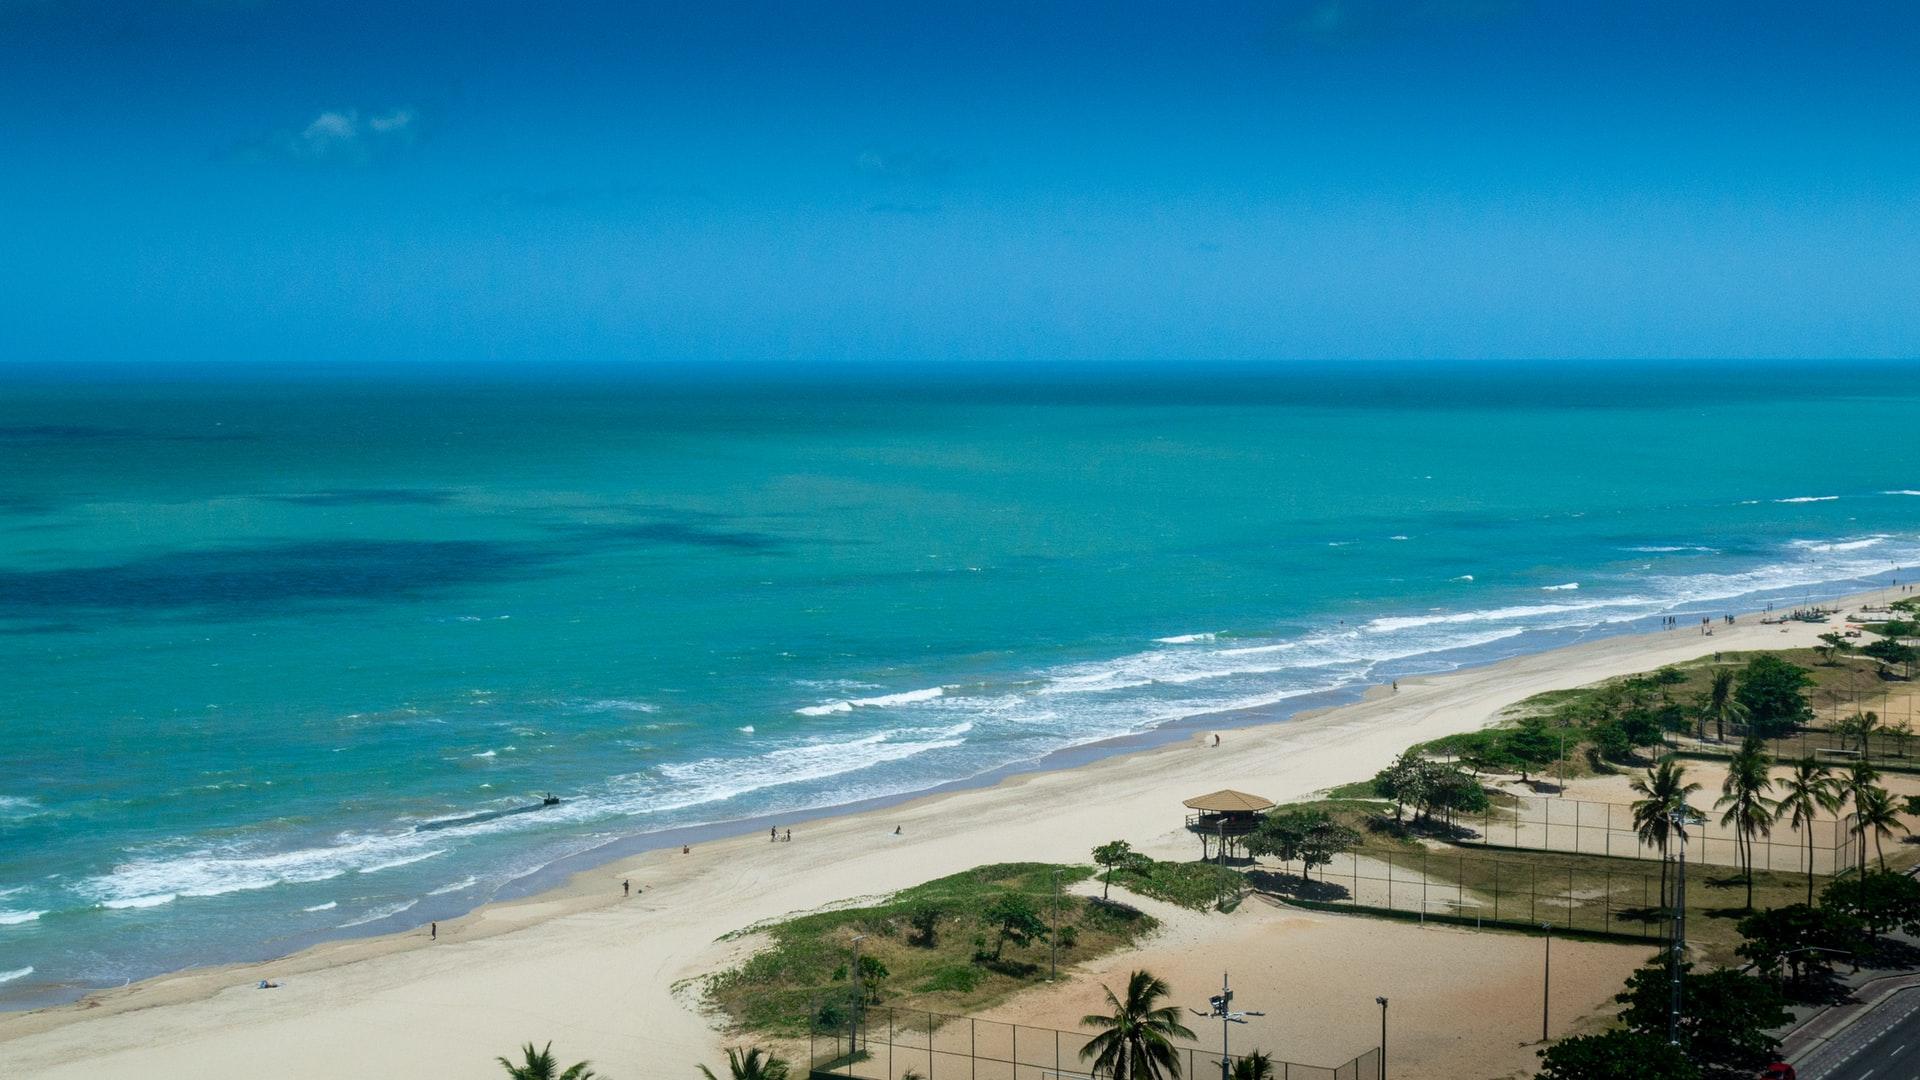 Orla da praia da Pina em Recife.